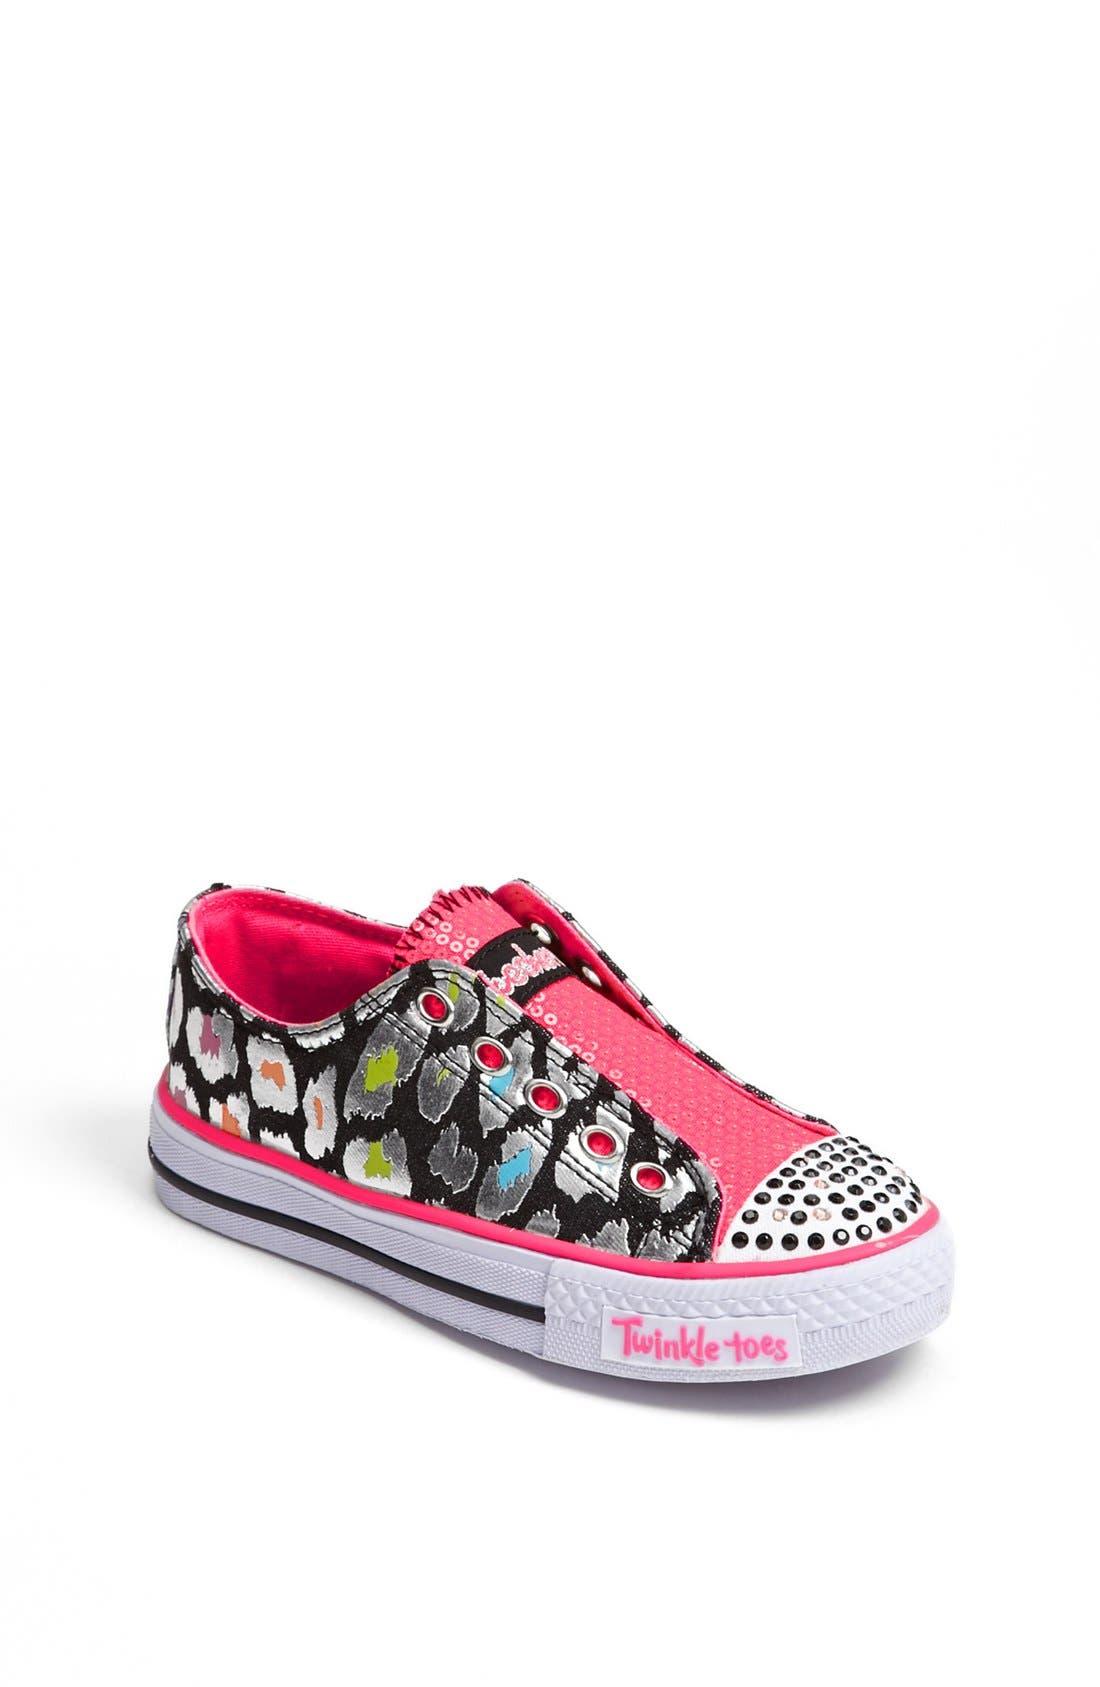 Main Image - SKECHERS 'Twinkle Toes' Light-Up Sneaker (Toddler & Little Kid)